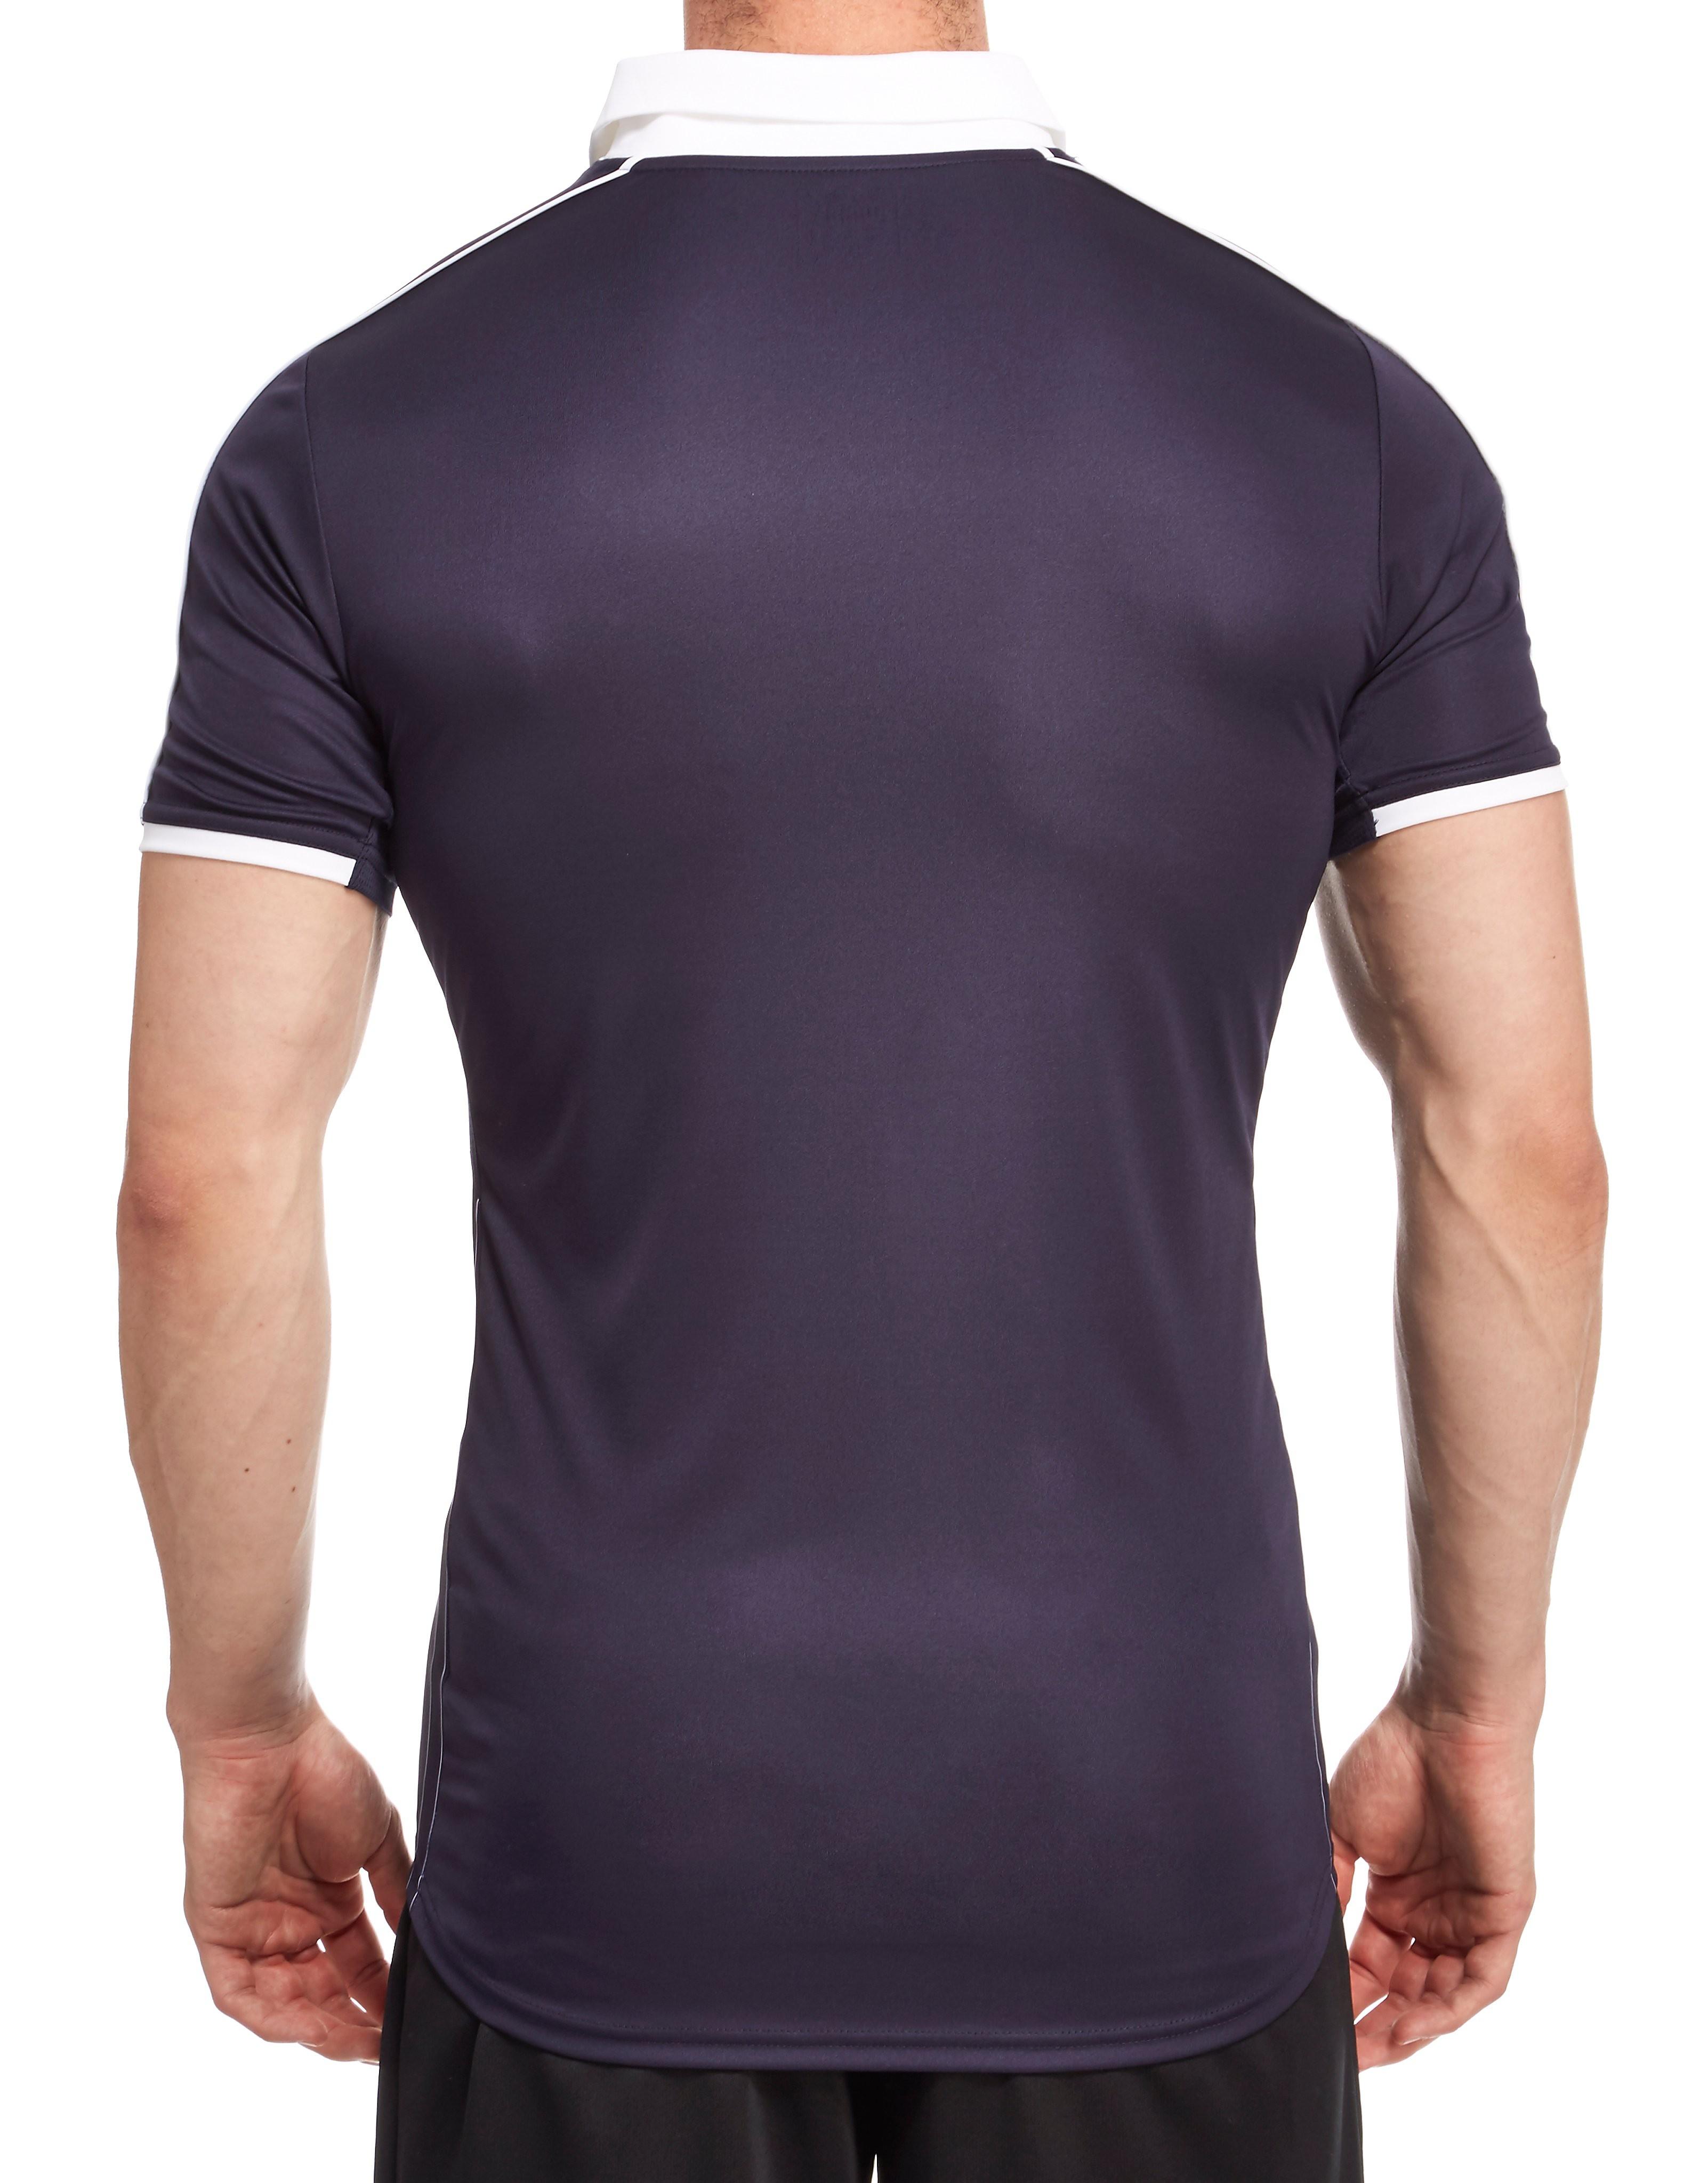 PUMA Bordeaux 2016/17 Home Shirt